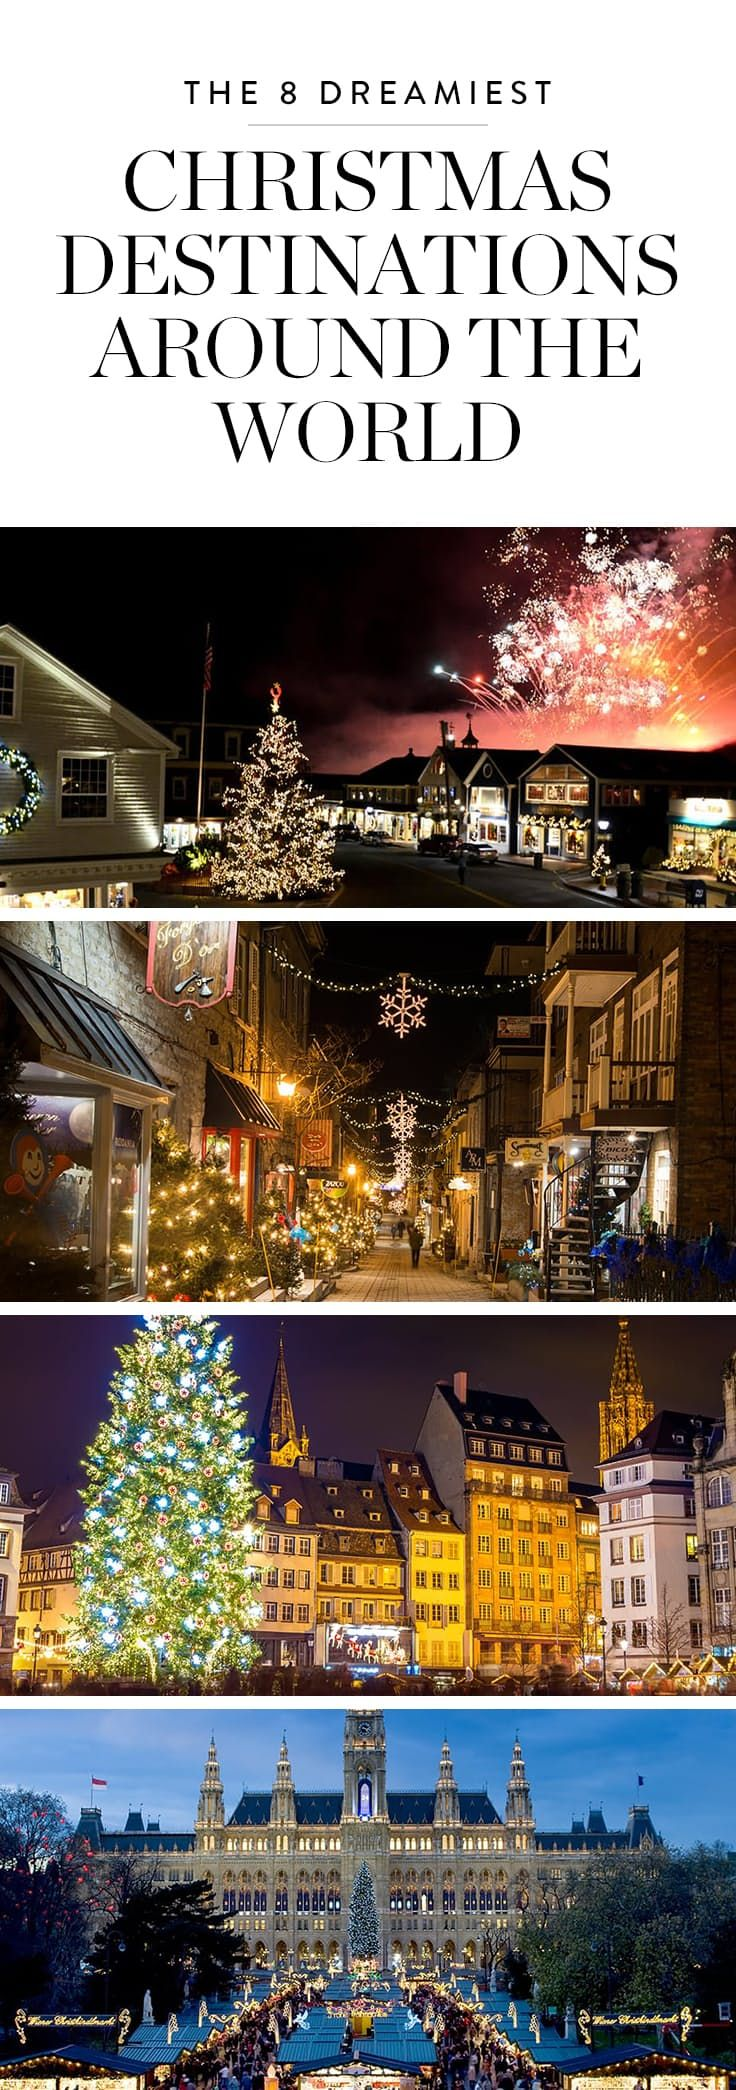 The 8 Dreamiest Christmas Destinations Around the World via @PureWow